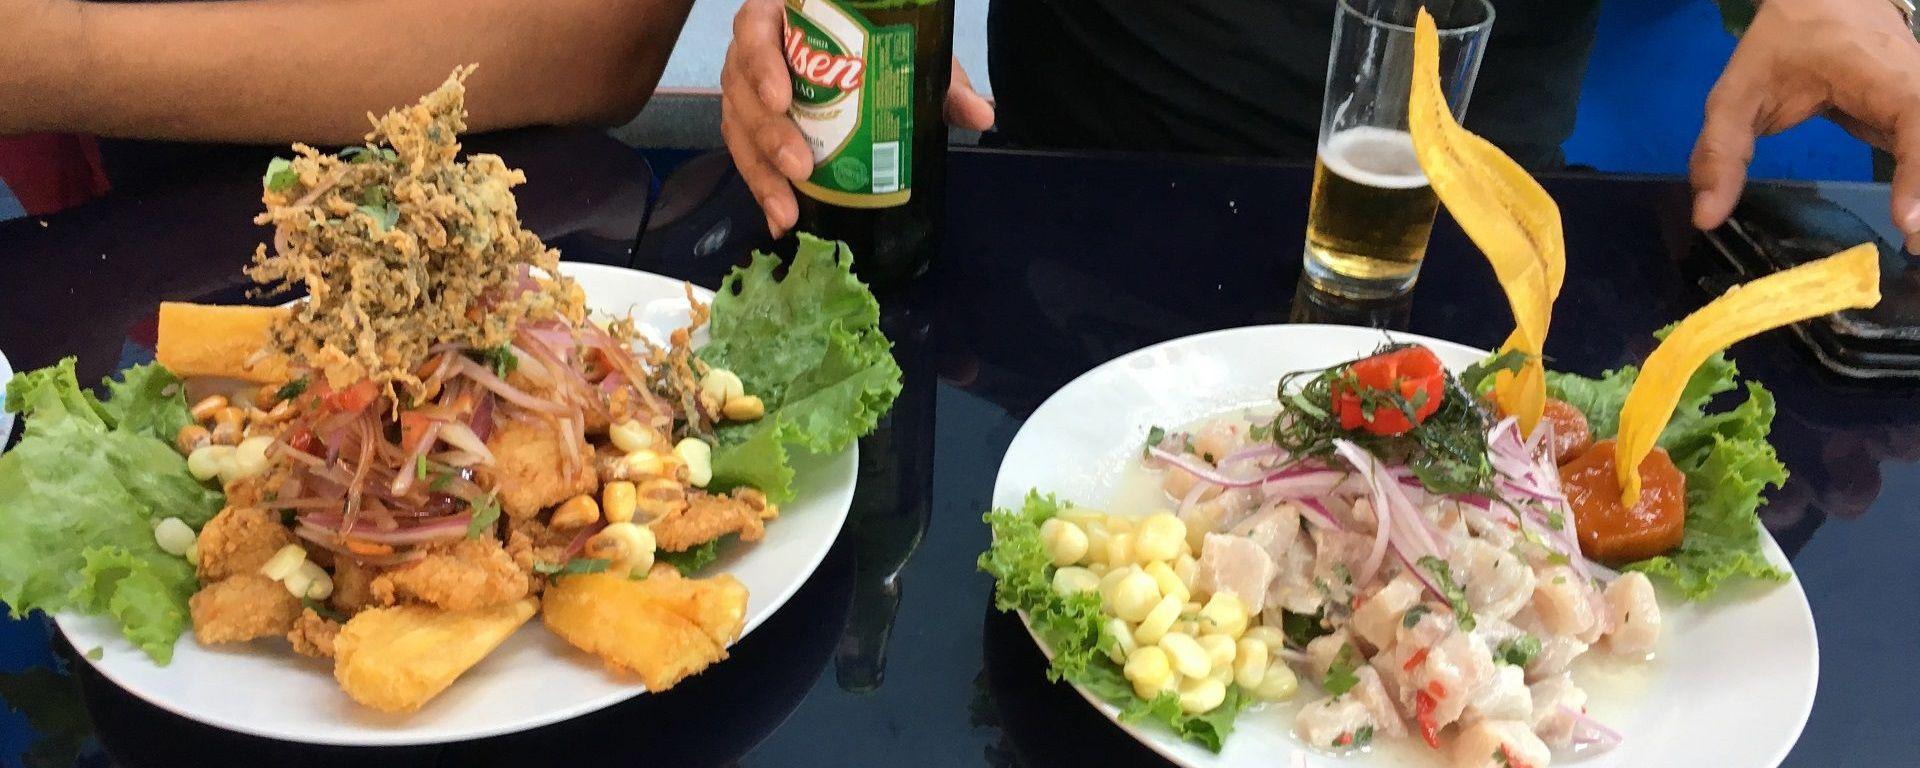 ceviche-parihuela-lima-callao